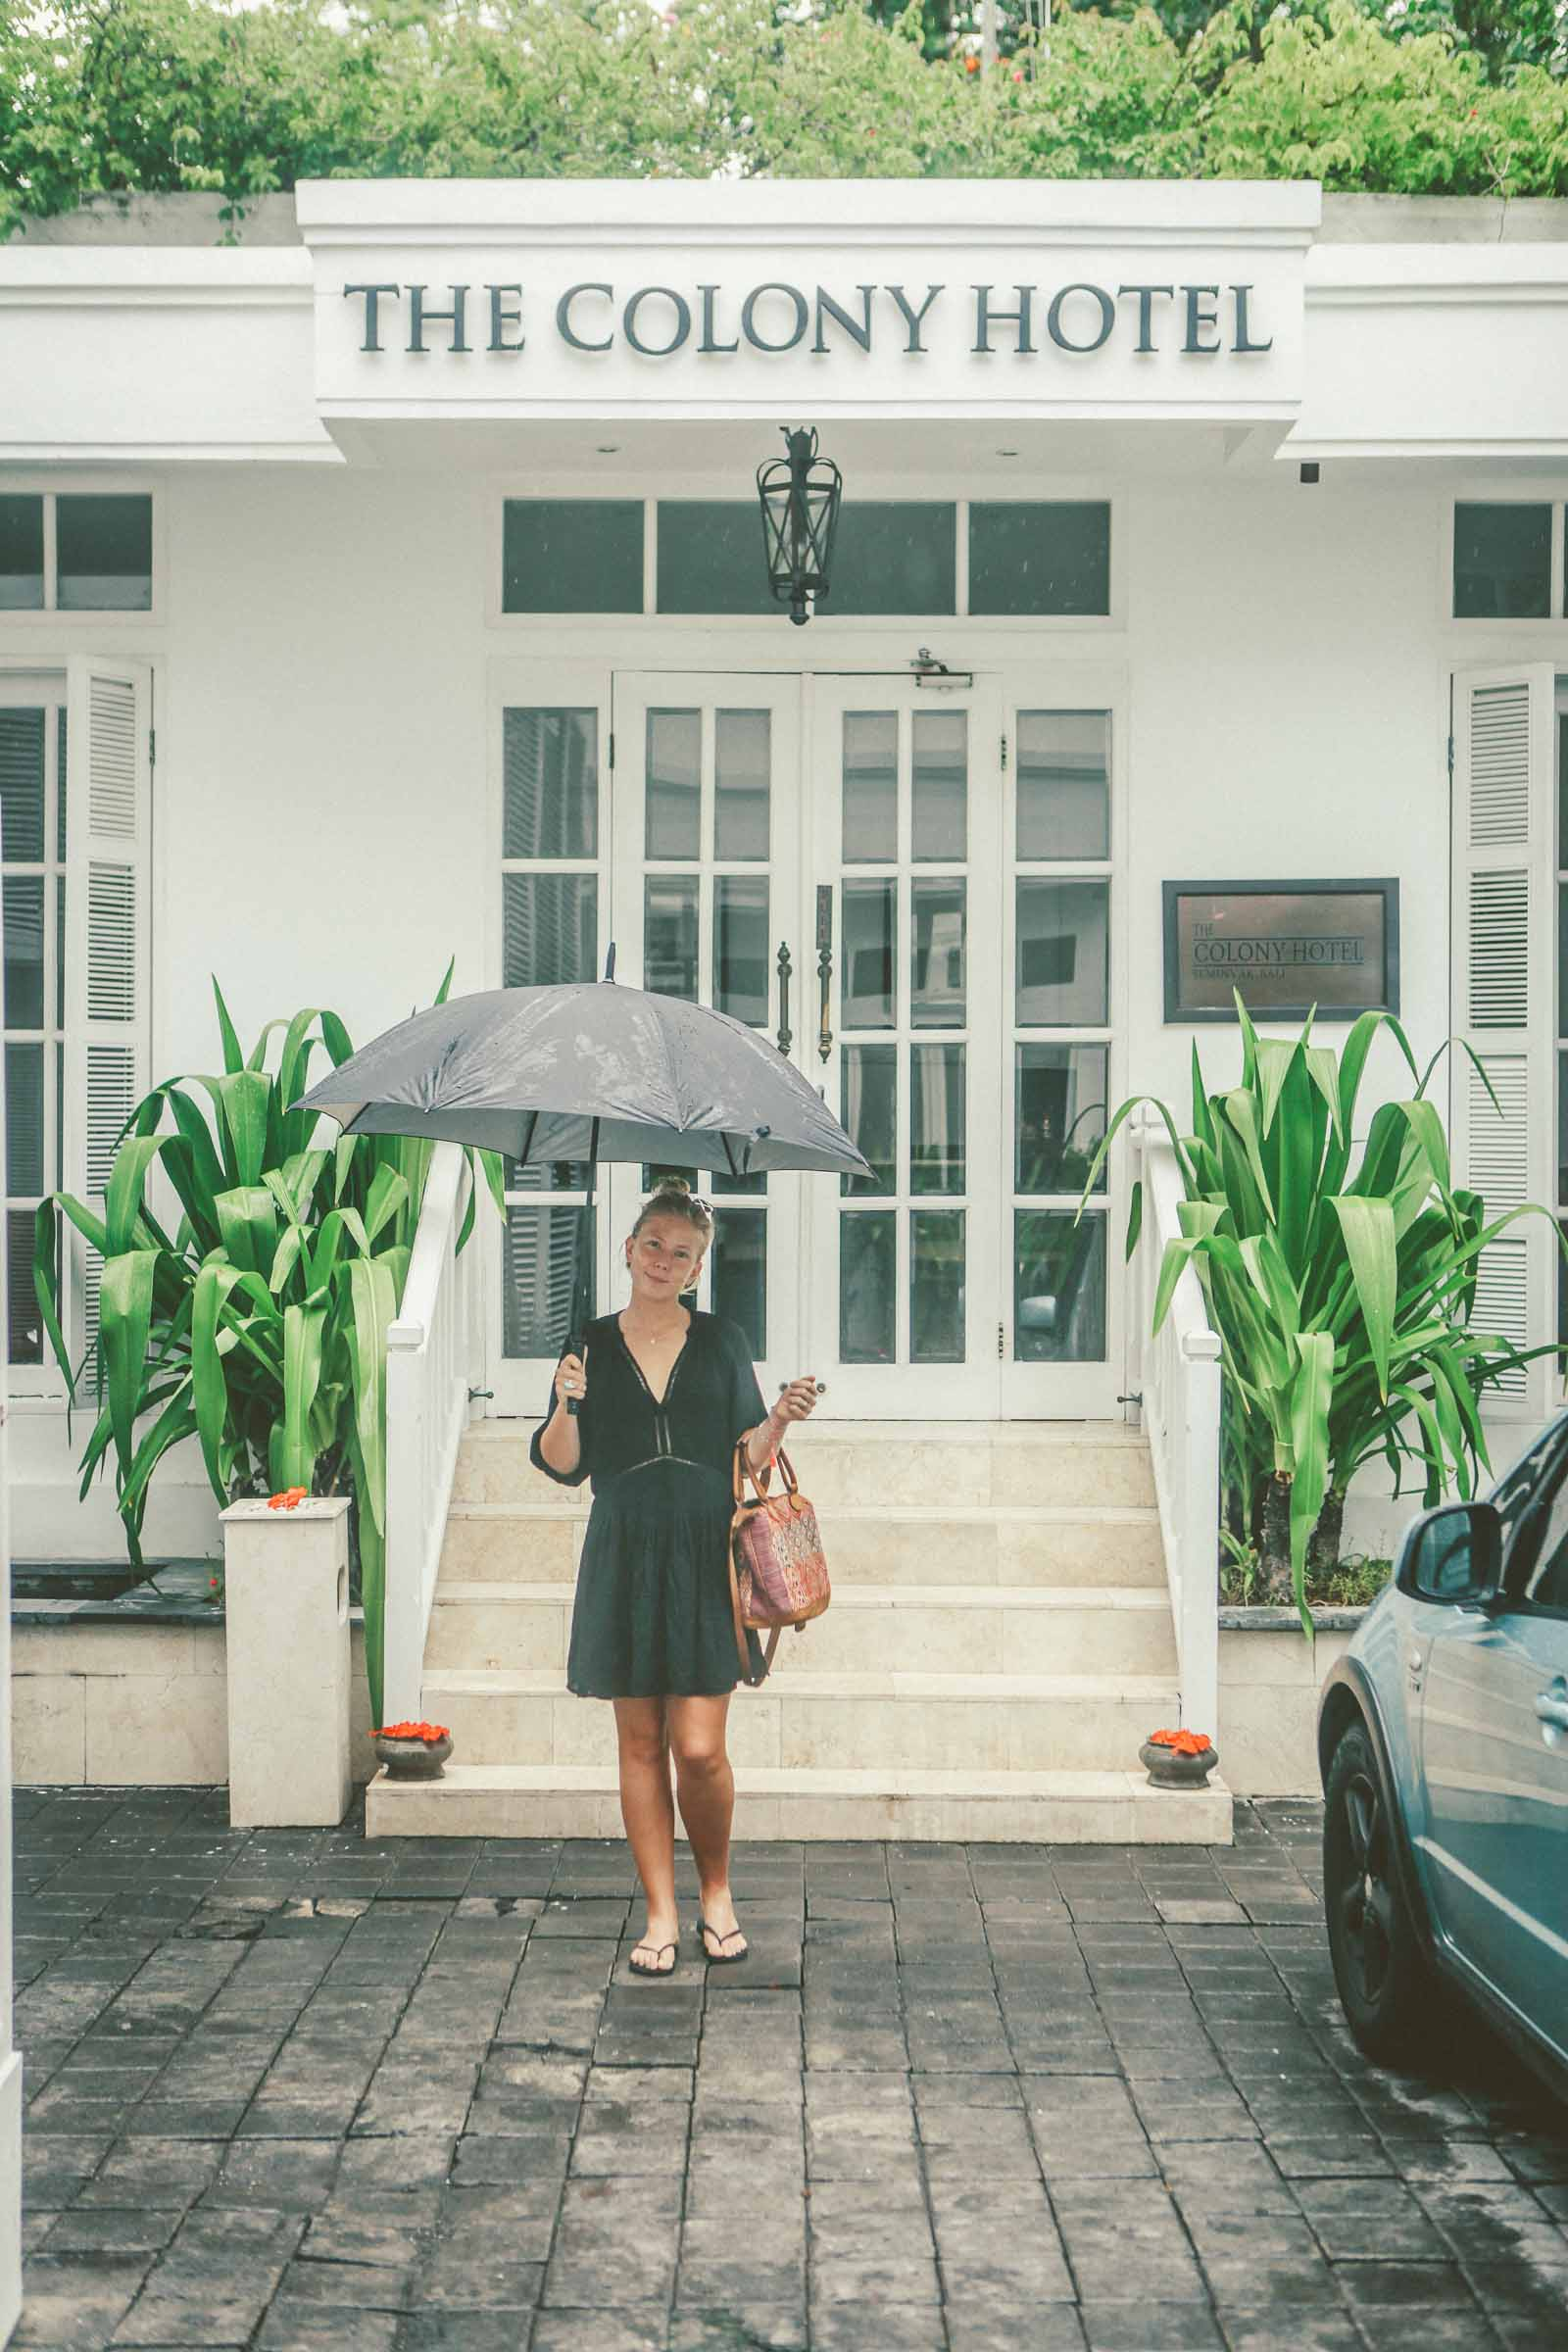 Bali-Travel-Blog-Seminyak-Restaurant-Bar-Breakfast-Surf-Uluwatu-The-Colonial-Hotel-Sea-Circus-2375